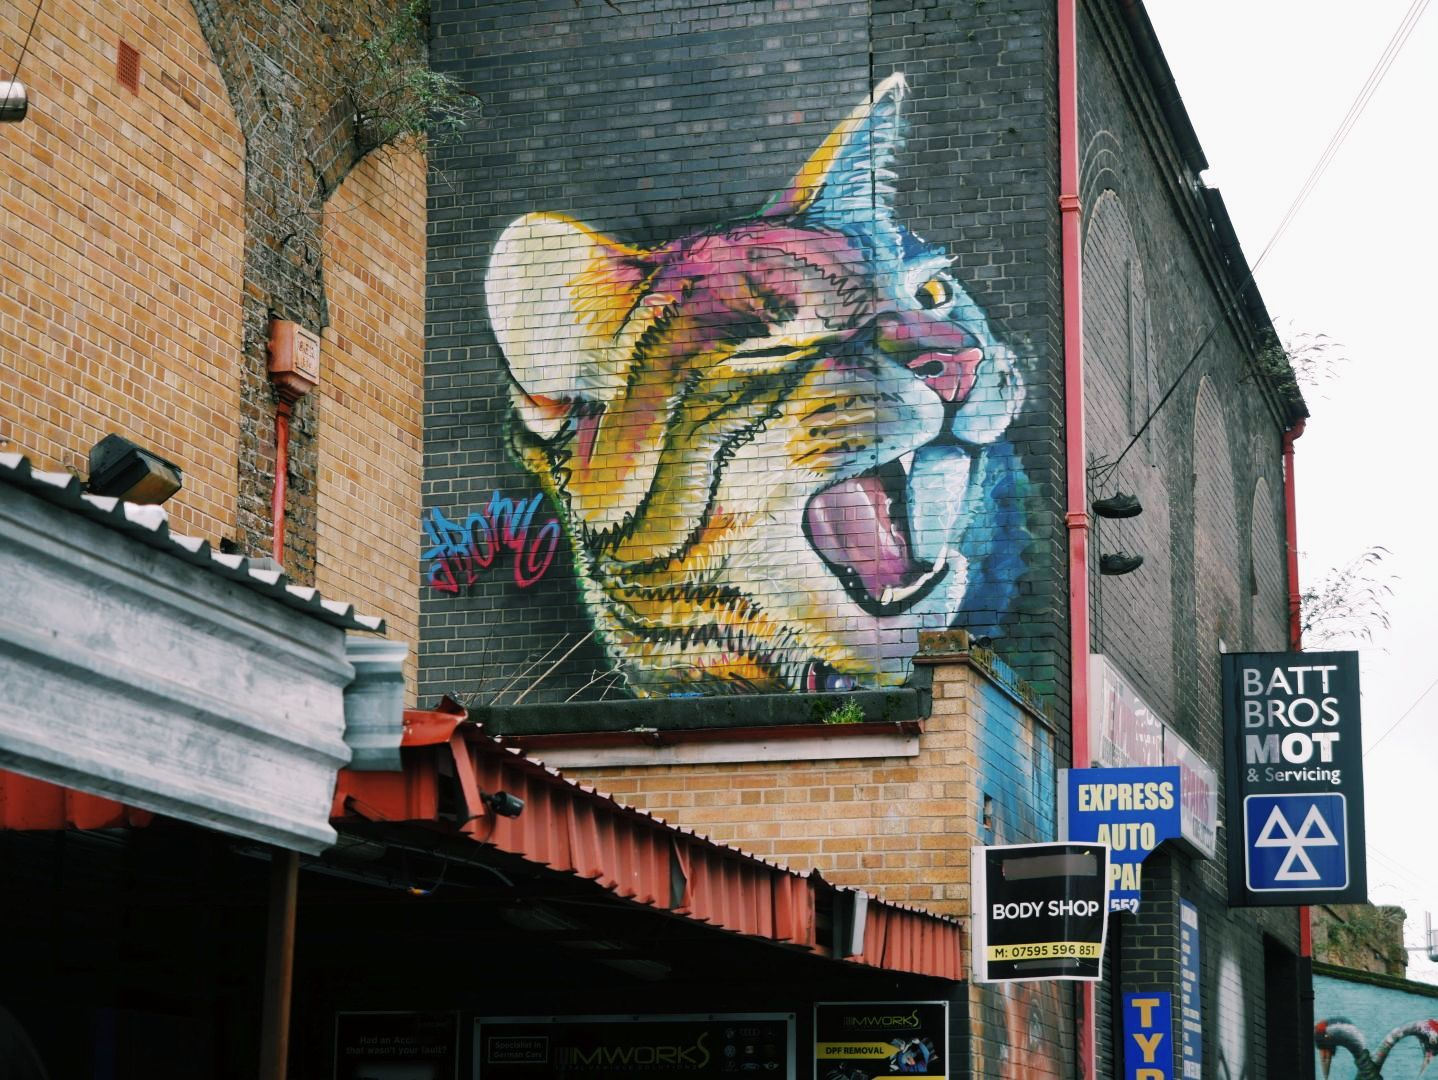 london-street-art.jpg